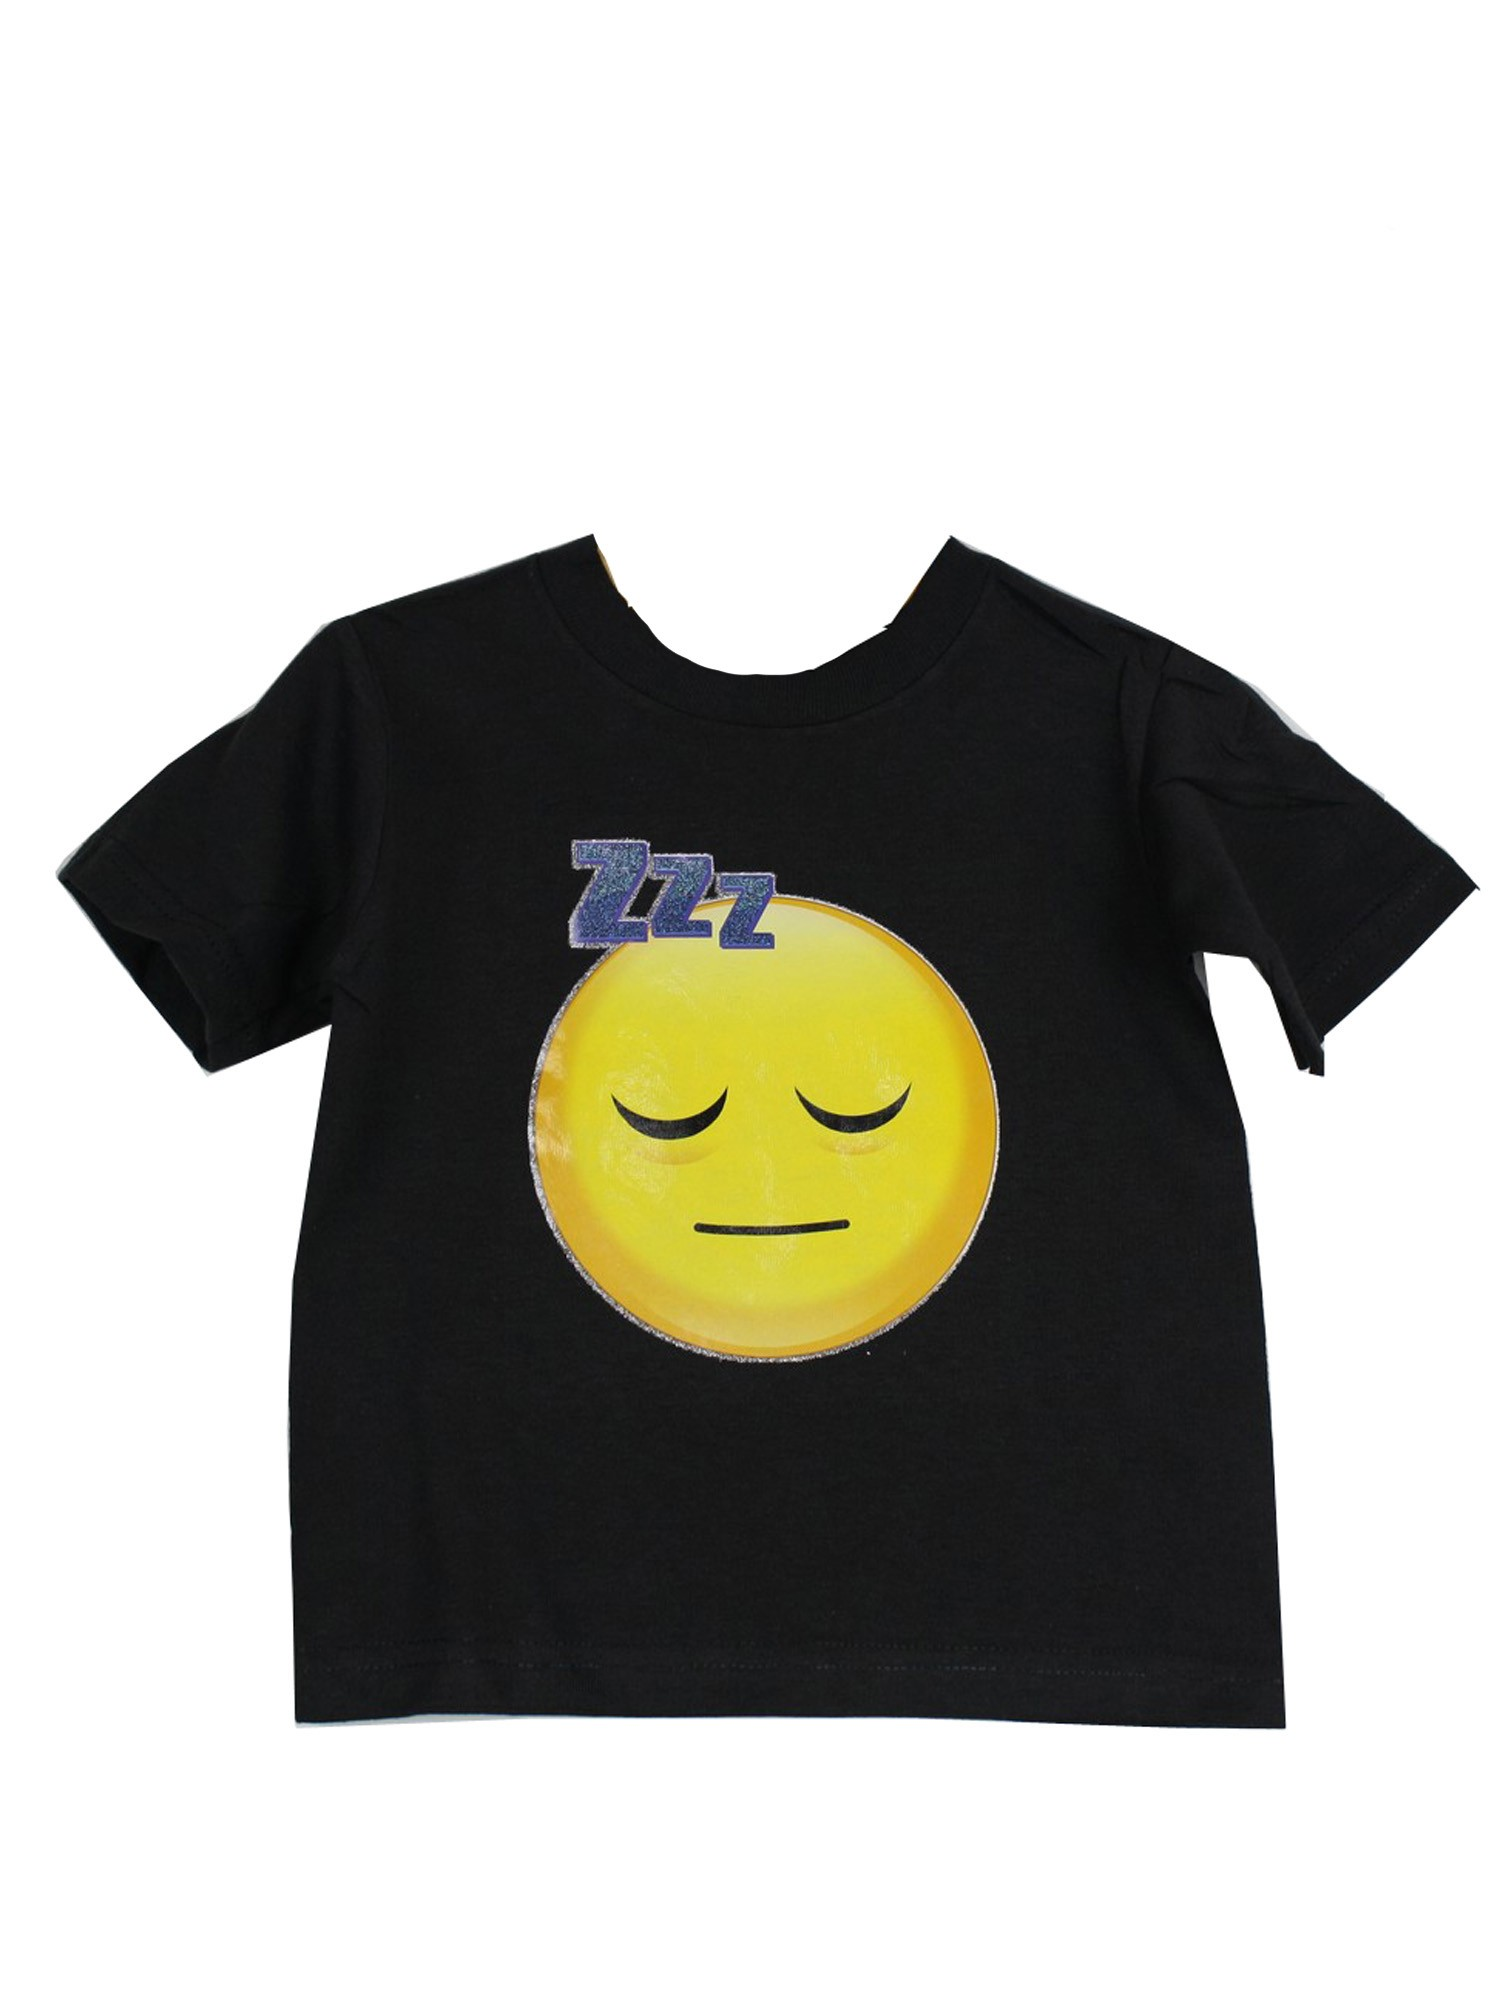 Unisex Black Yellow Sleeping Face Emoji Print Cotton Trendy T-Shirt